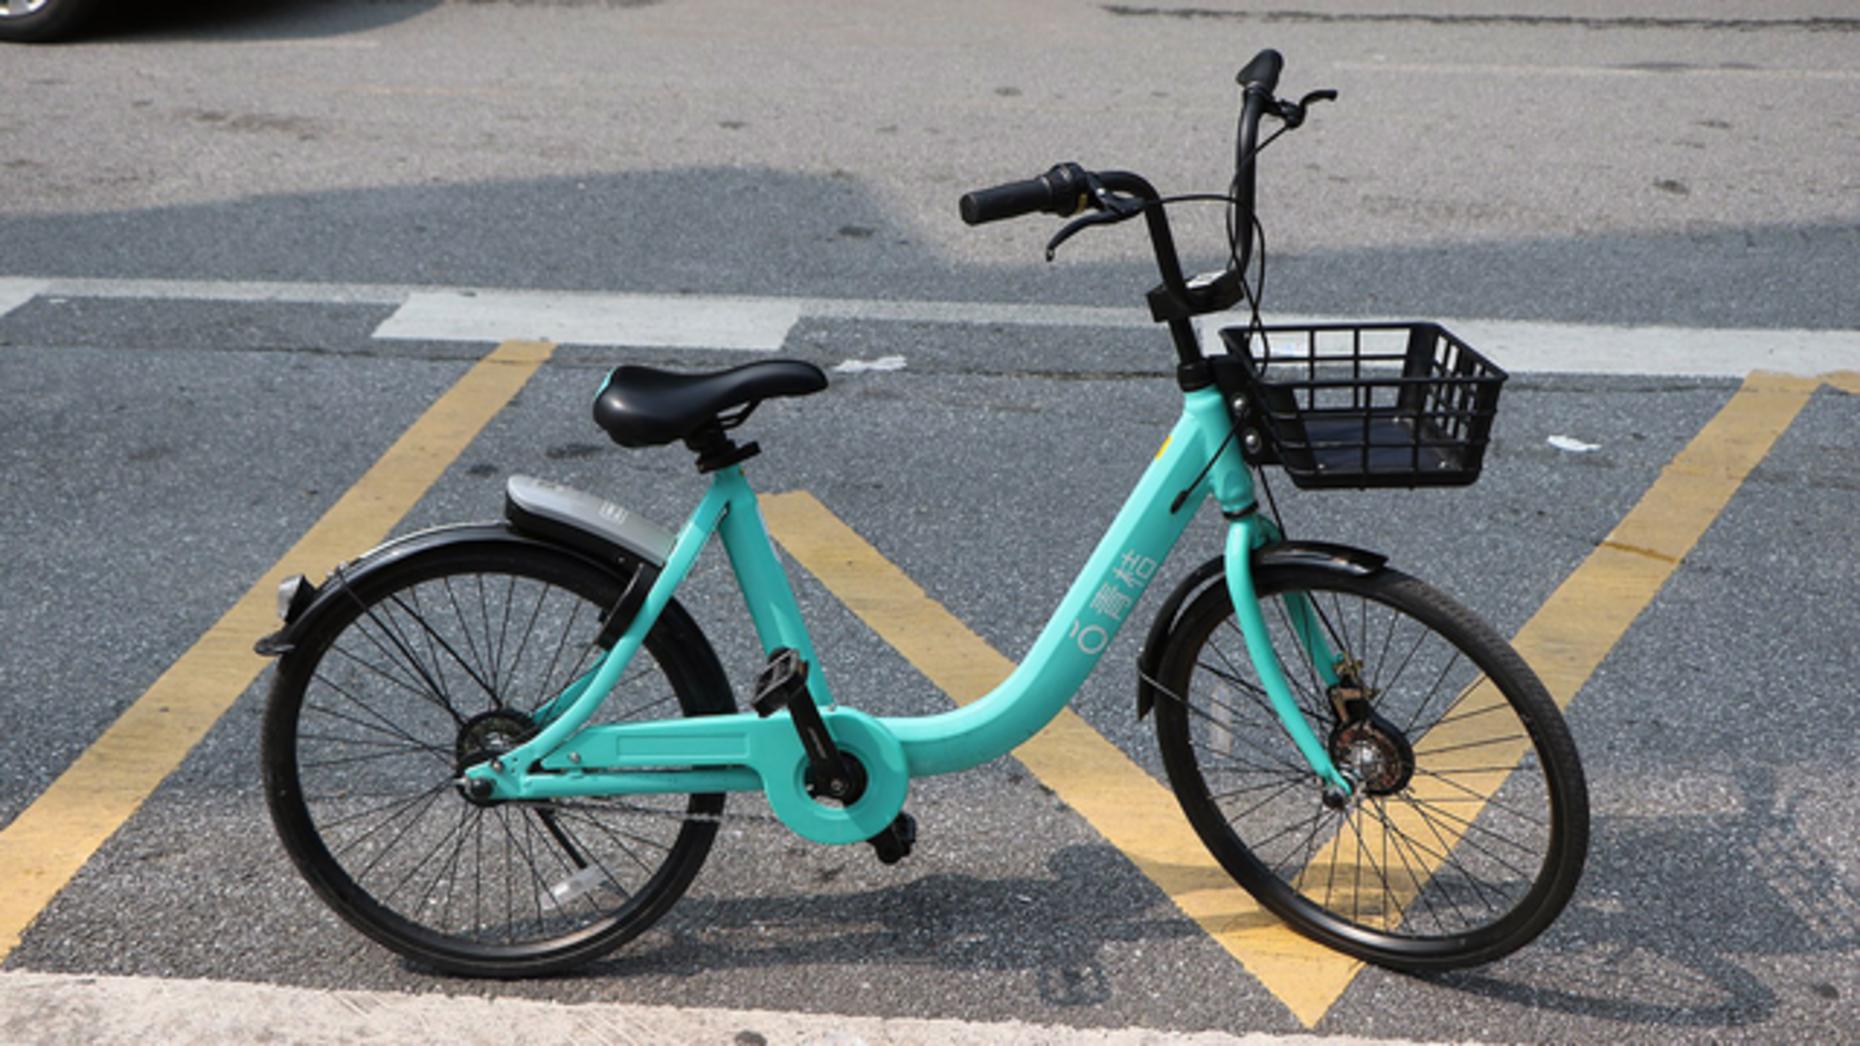 A bike from Didi's Qingju bike-sharing service.